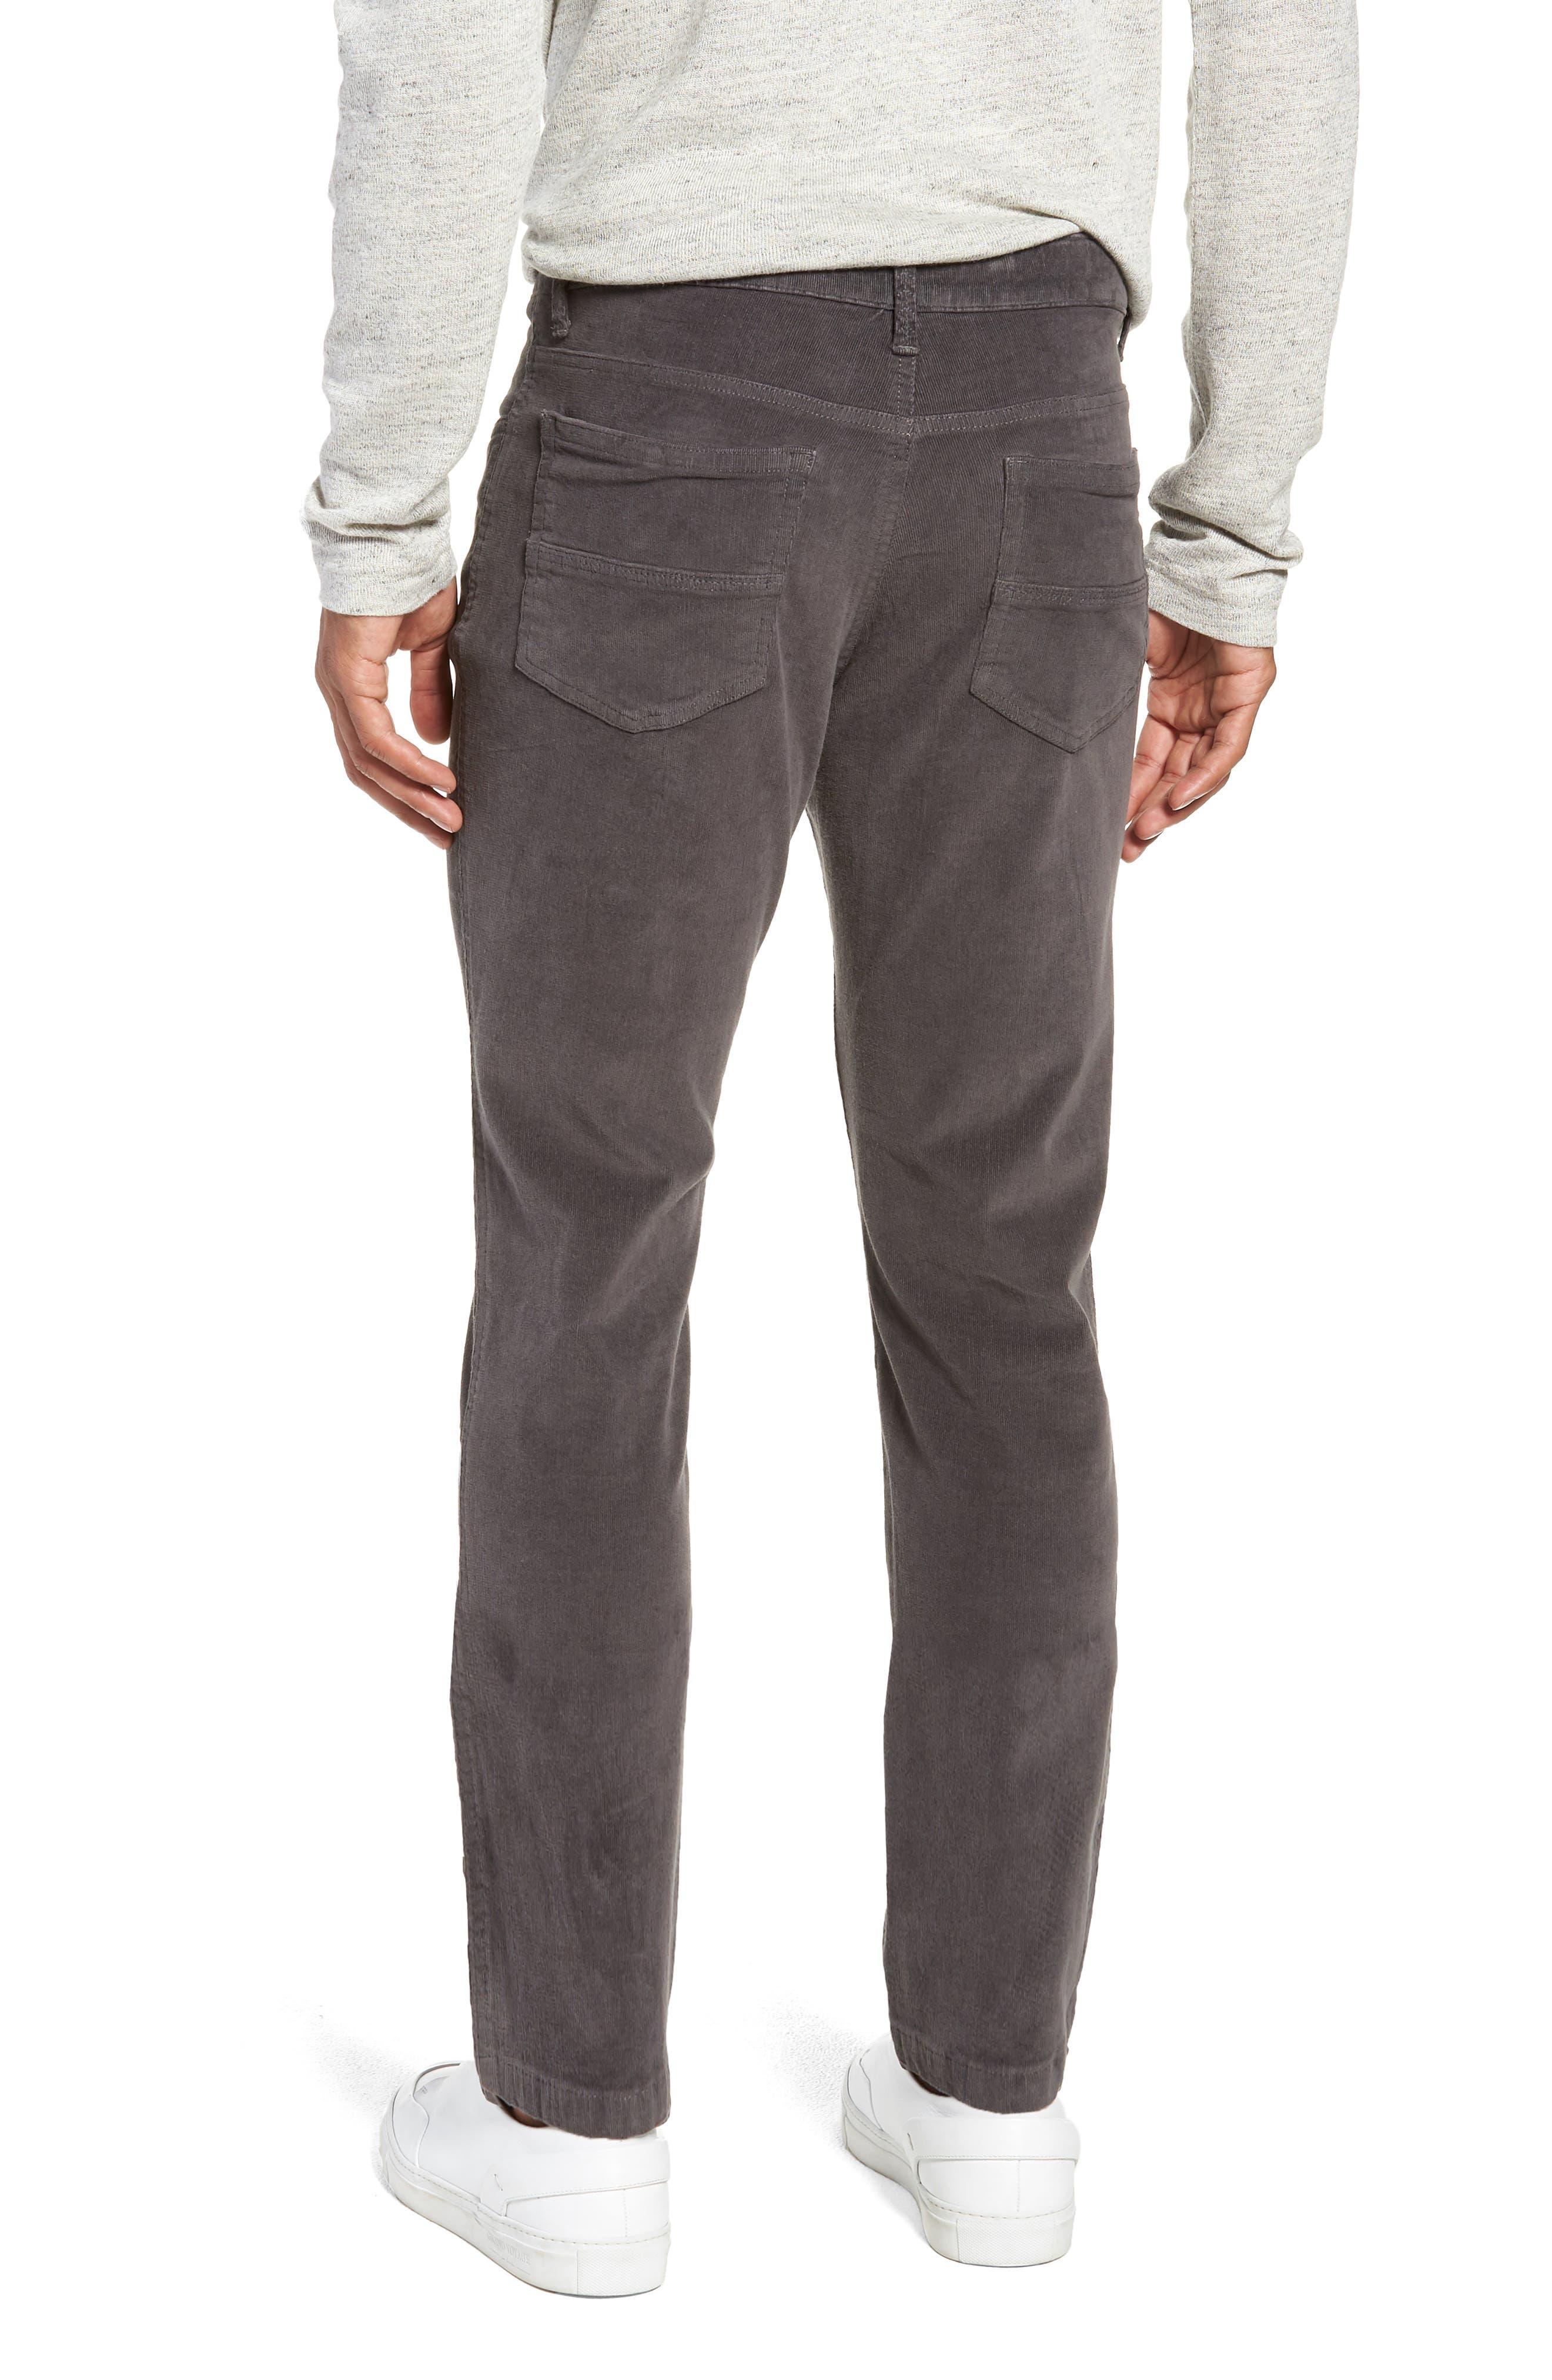 VINTAGE 1946,                             Modern Fit Stretch Corduroy Pants,                             Alternate thumbnail 2, color,                             CHARCOAL